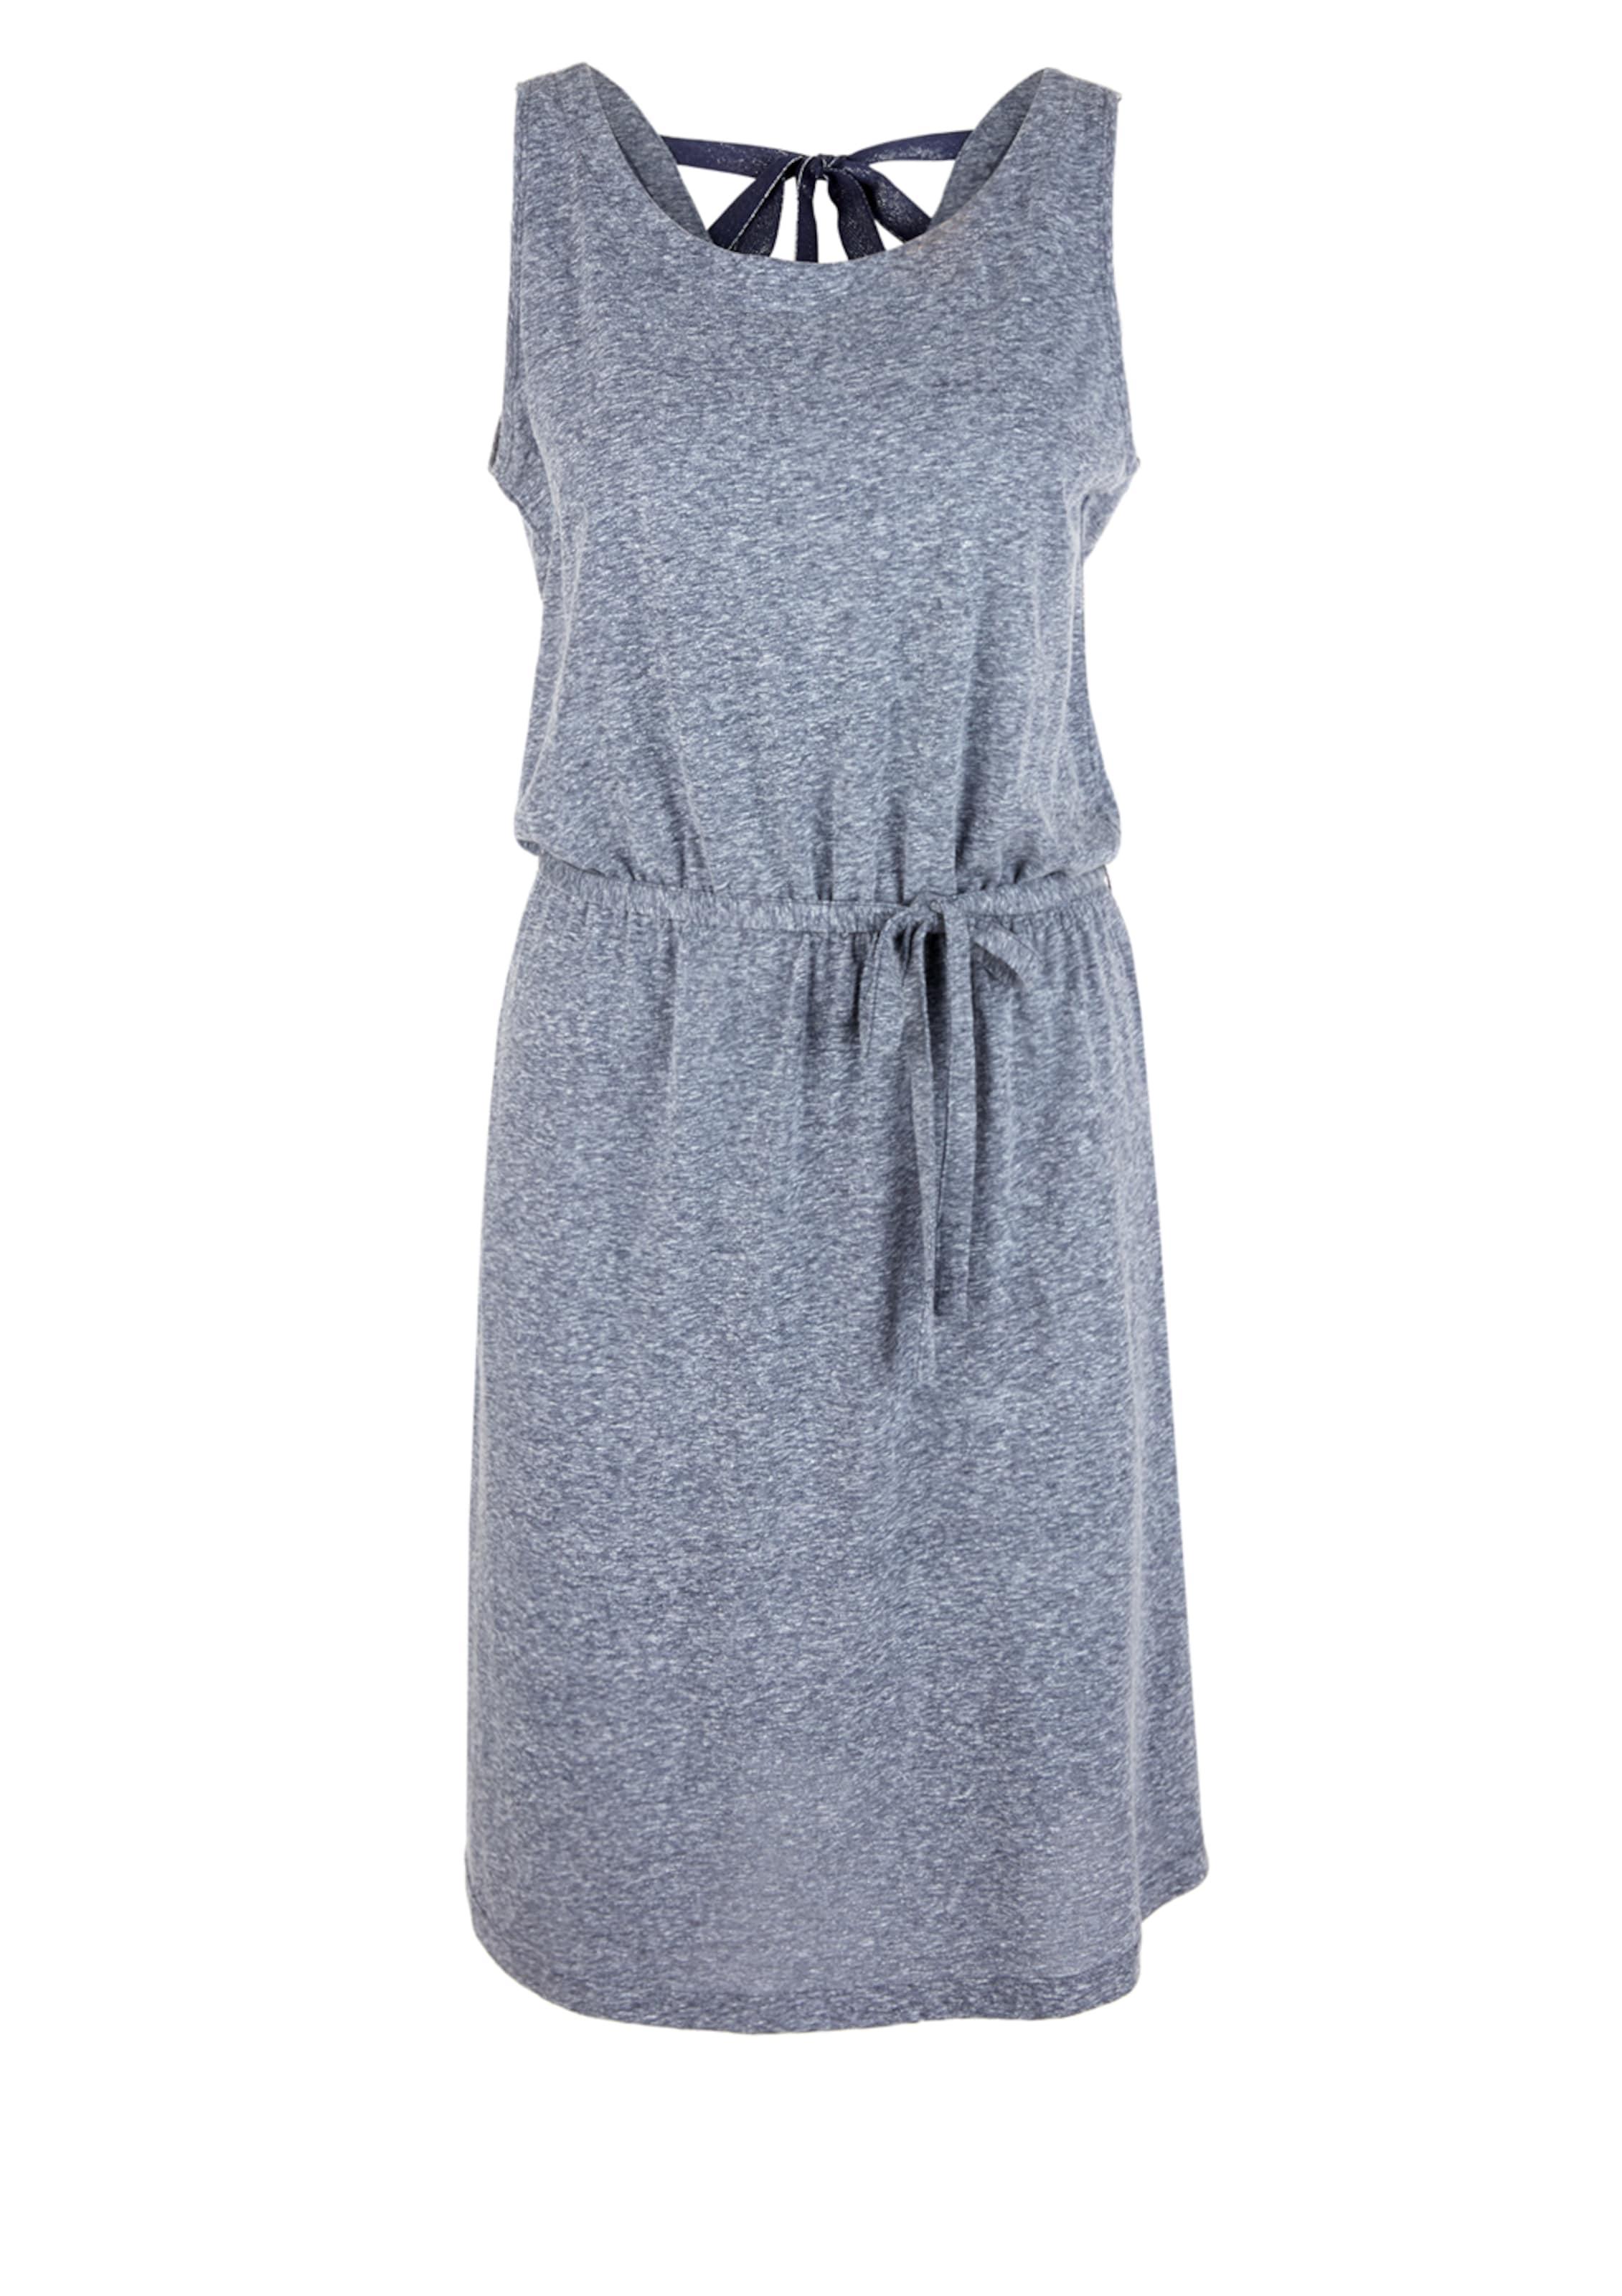 oliver S Red Kleid In Blaumeliert Label F1KcTlJ